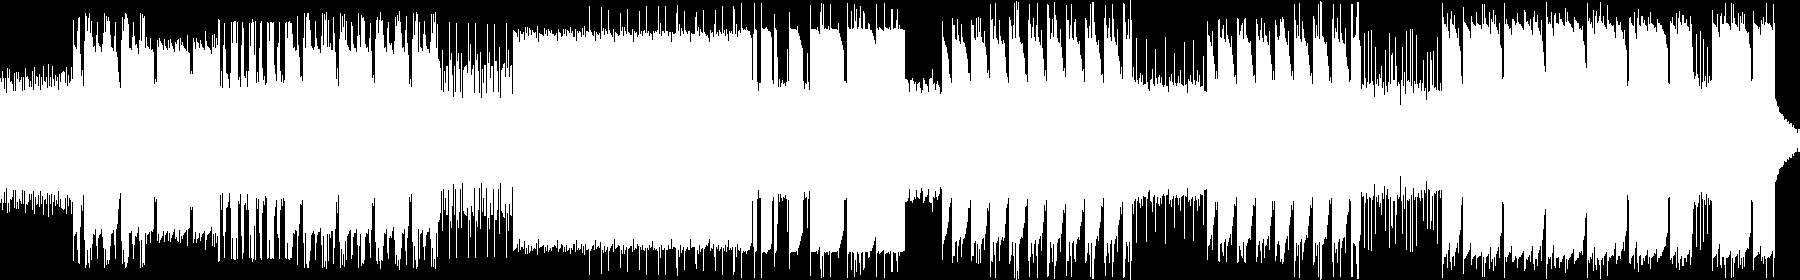 Bodak Trap audio waveform